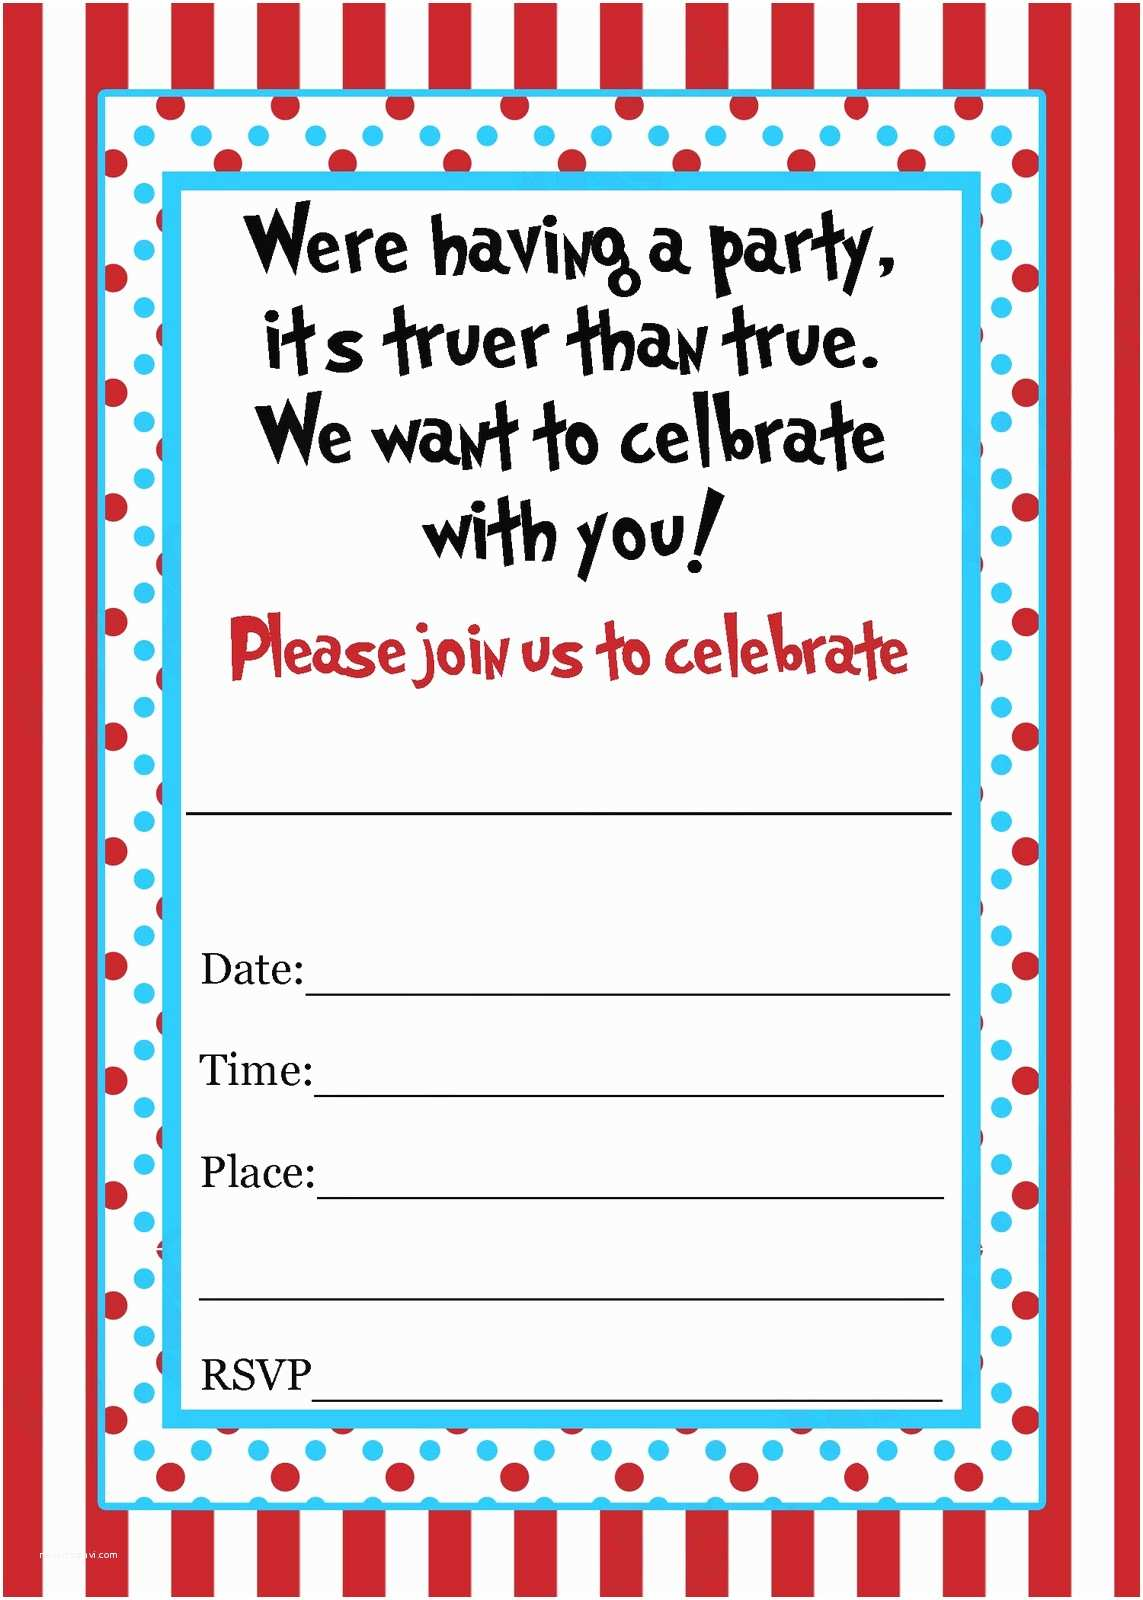 Blank Birthday Invitations 40th Birthday Ideas Blank Birthday Invitation Templates Free